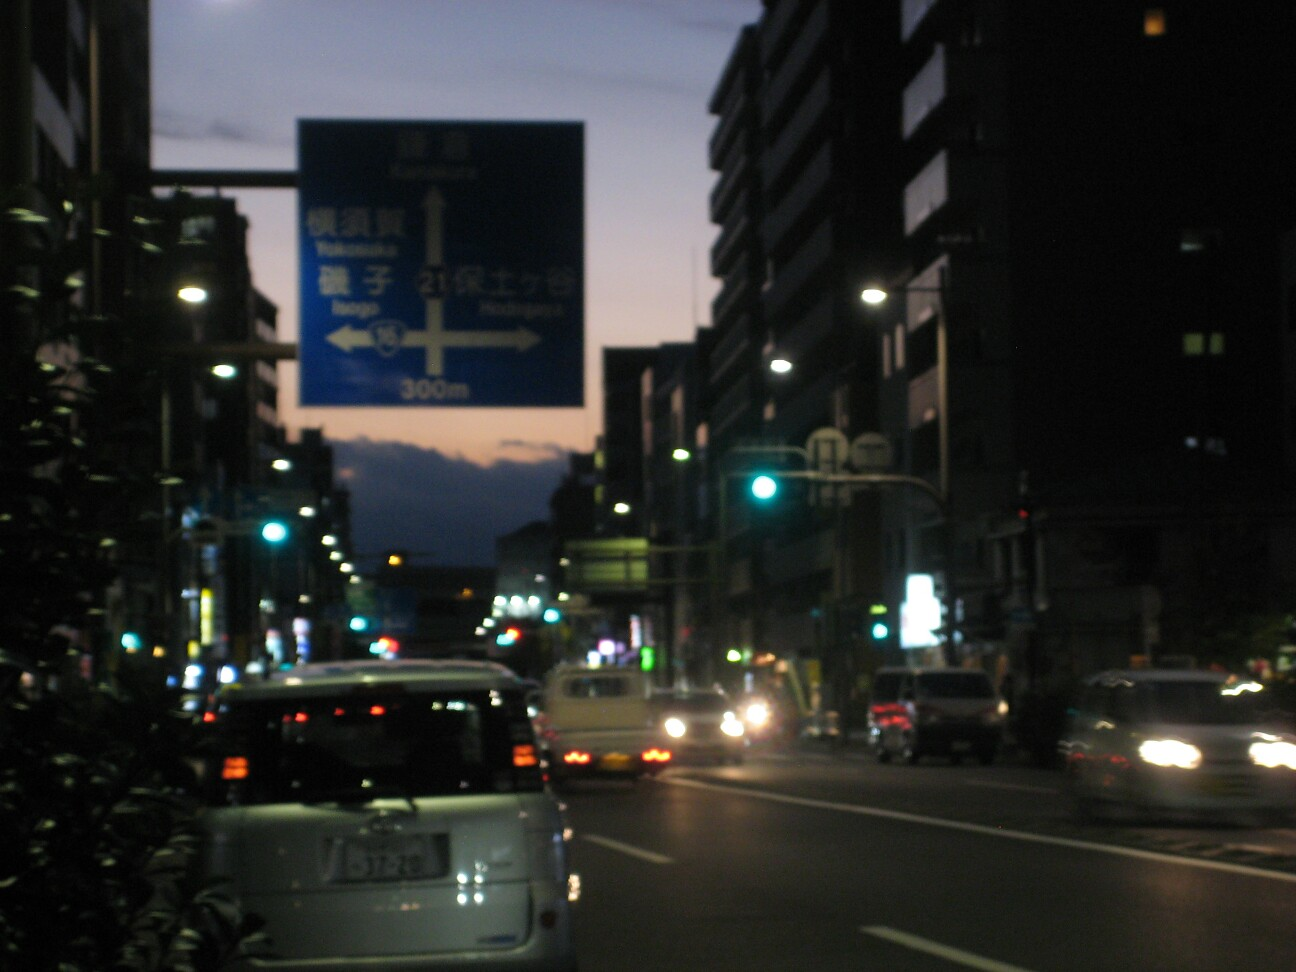 f:id:toranokotaro:20170116084436j:plain